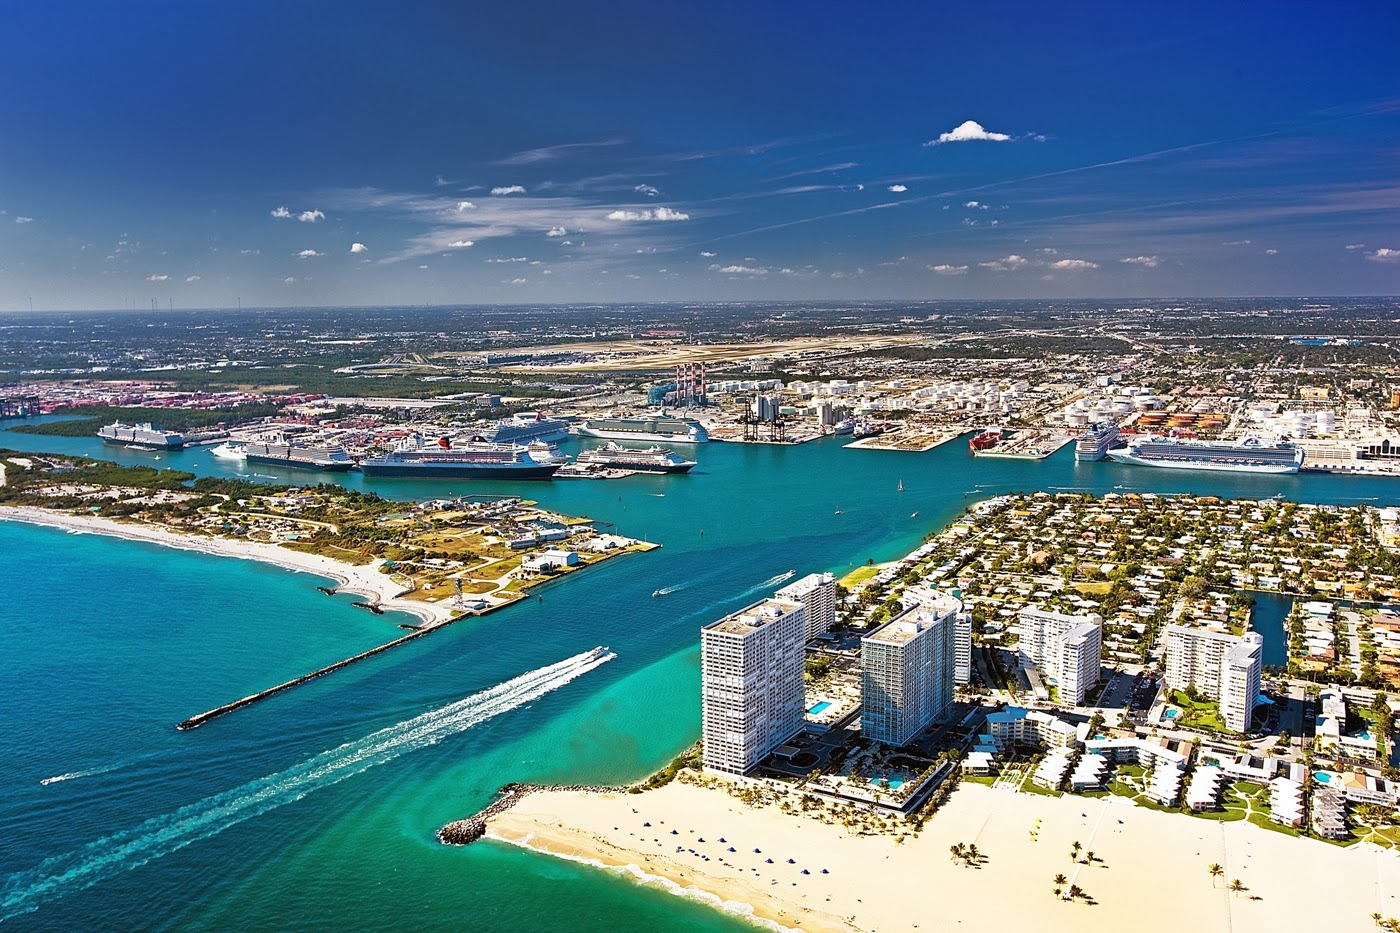 Florida Cruise Traveler Navy Cruise Ship Parking Port Miami Or Port Everglades